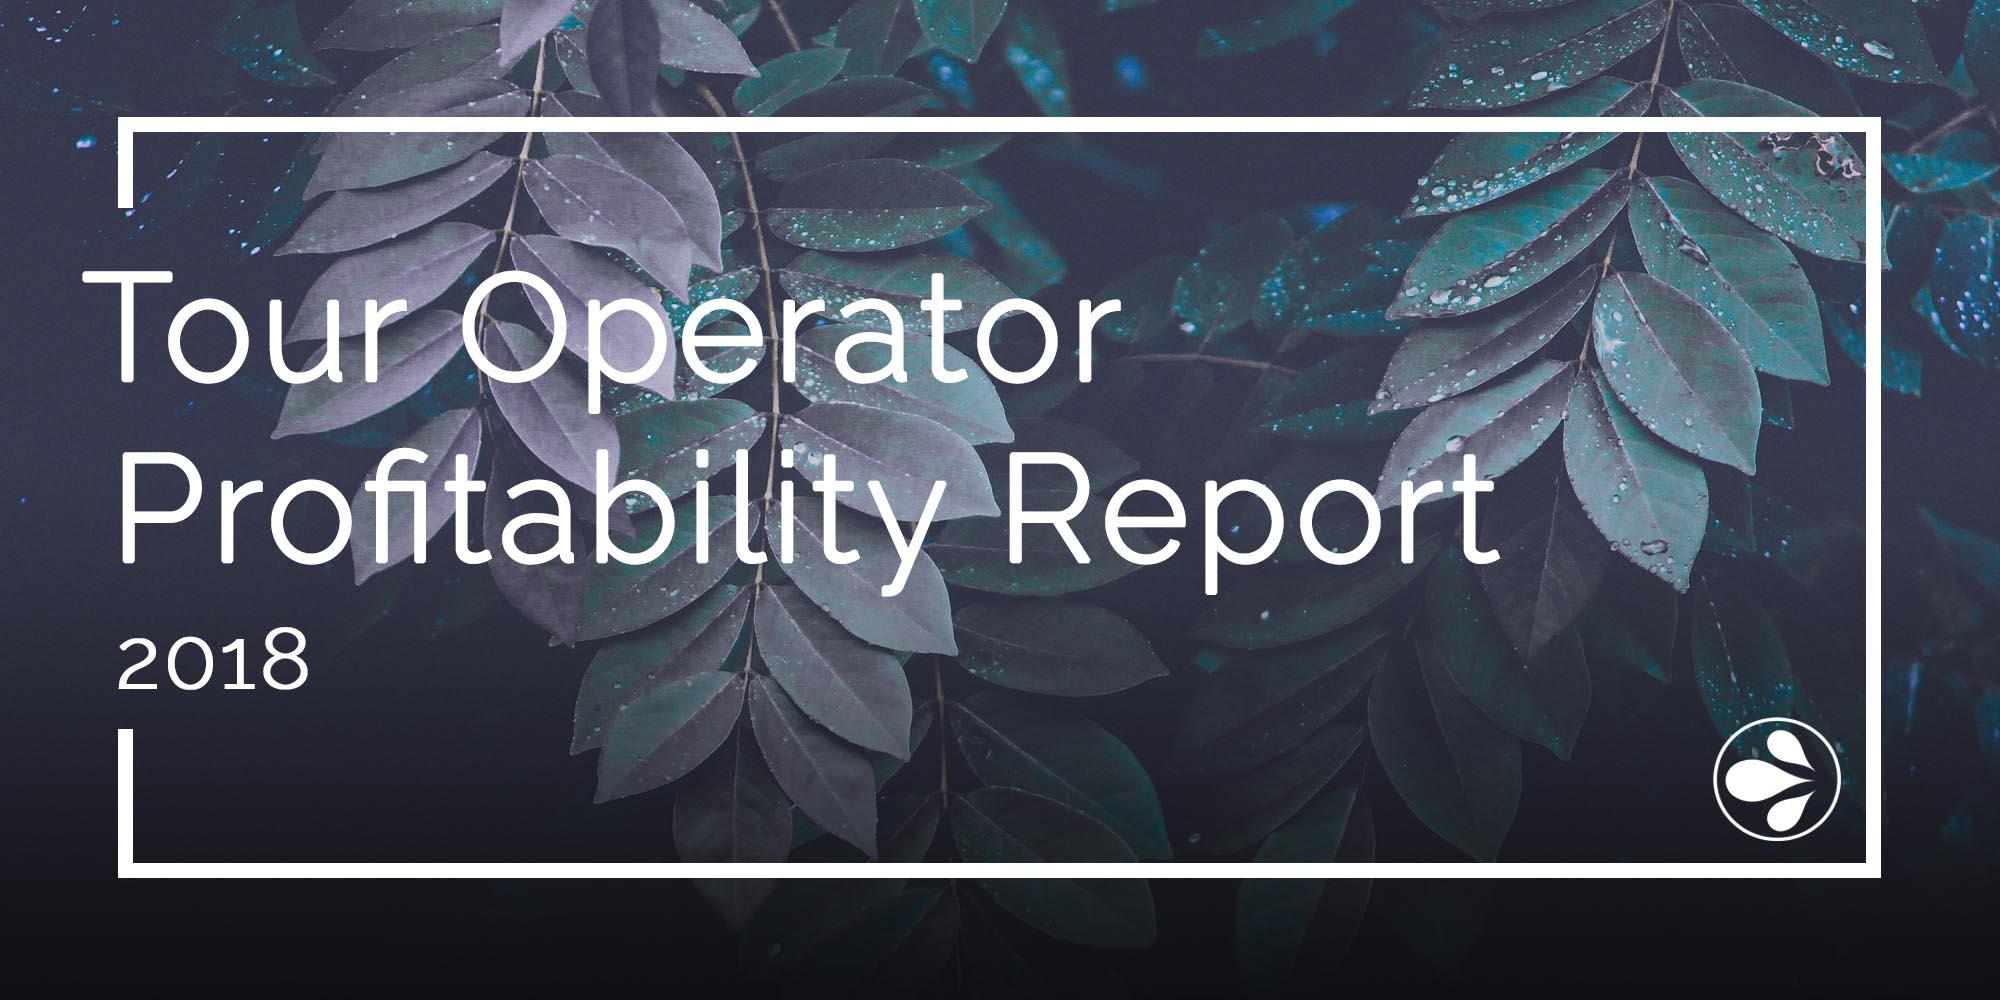 Tour Operator Profitability report 2018